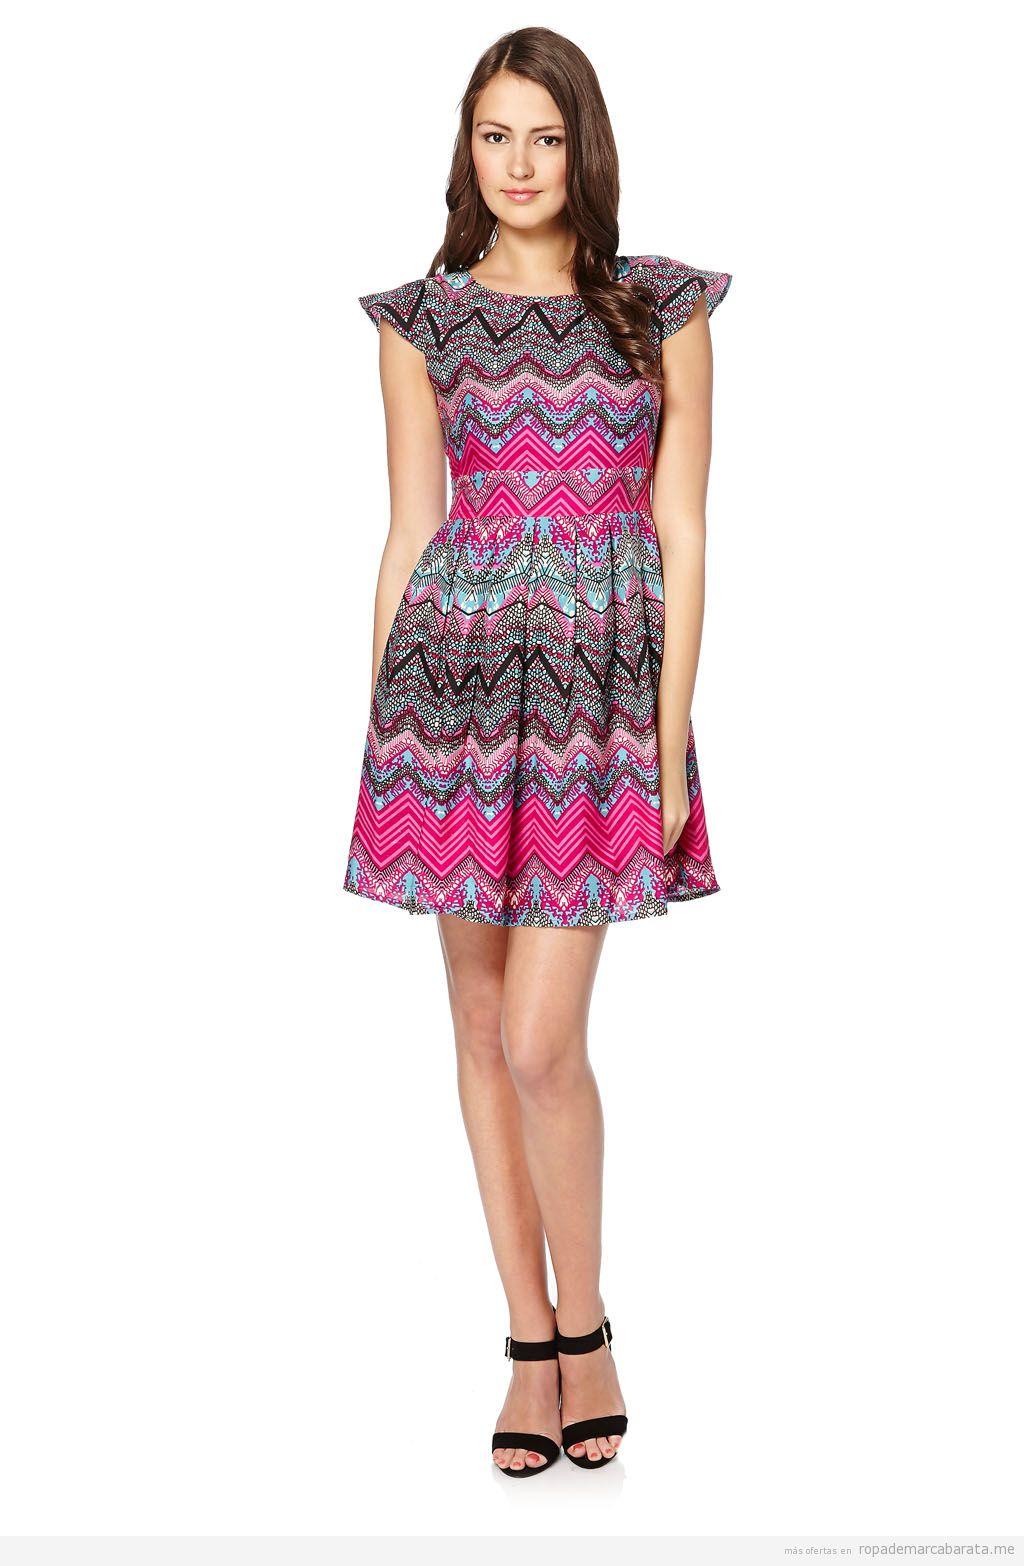 Vestido print geométrico marca Iska London barato, outlet online 2